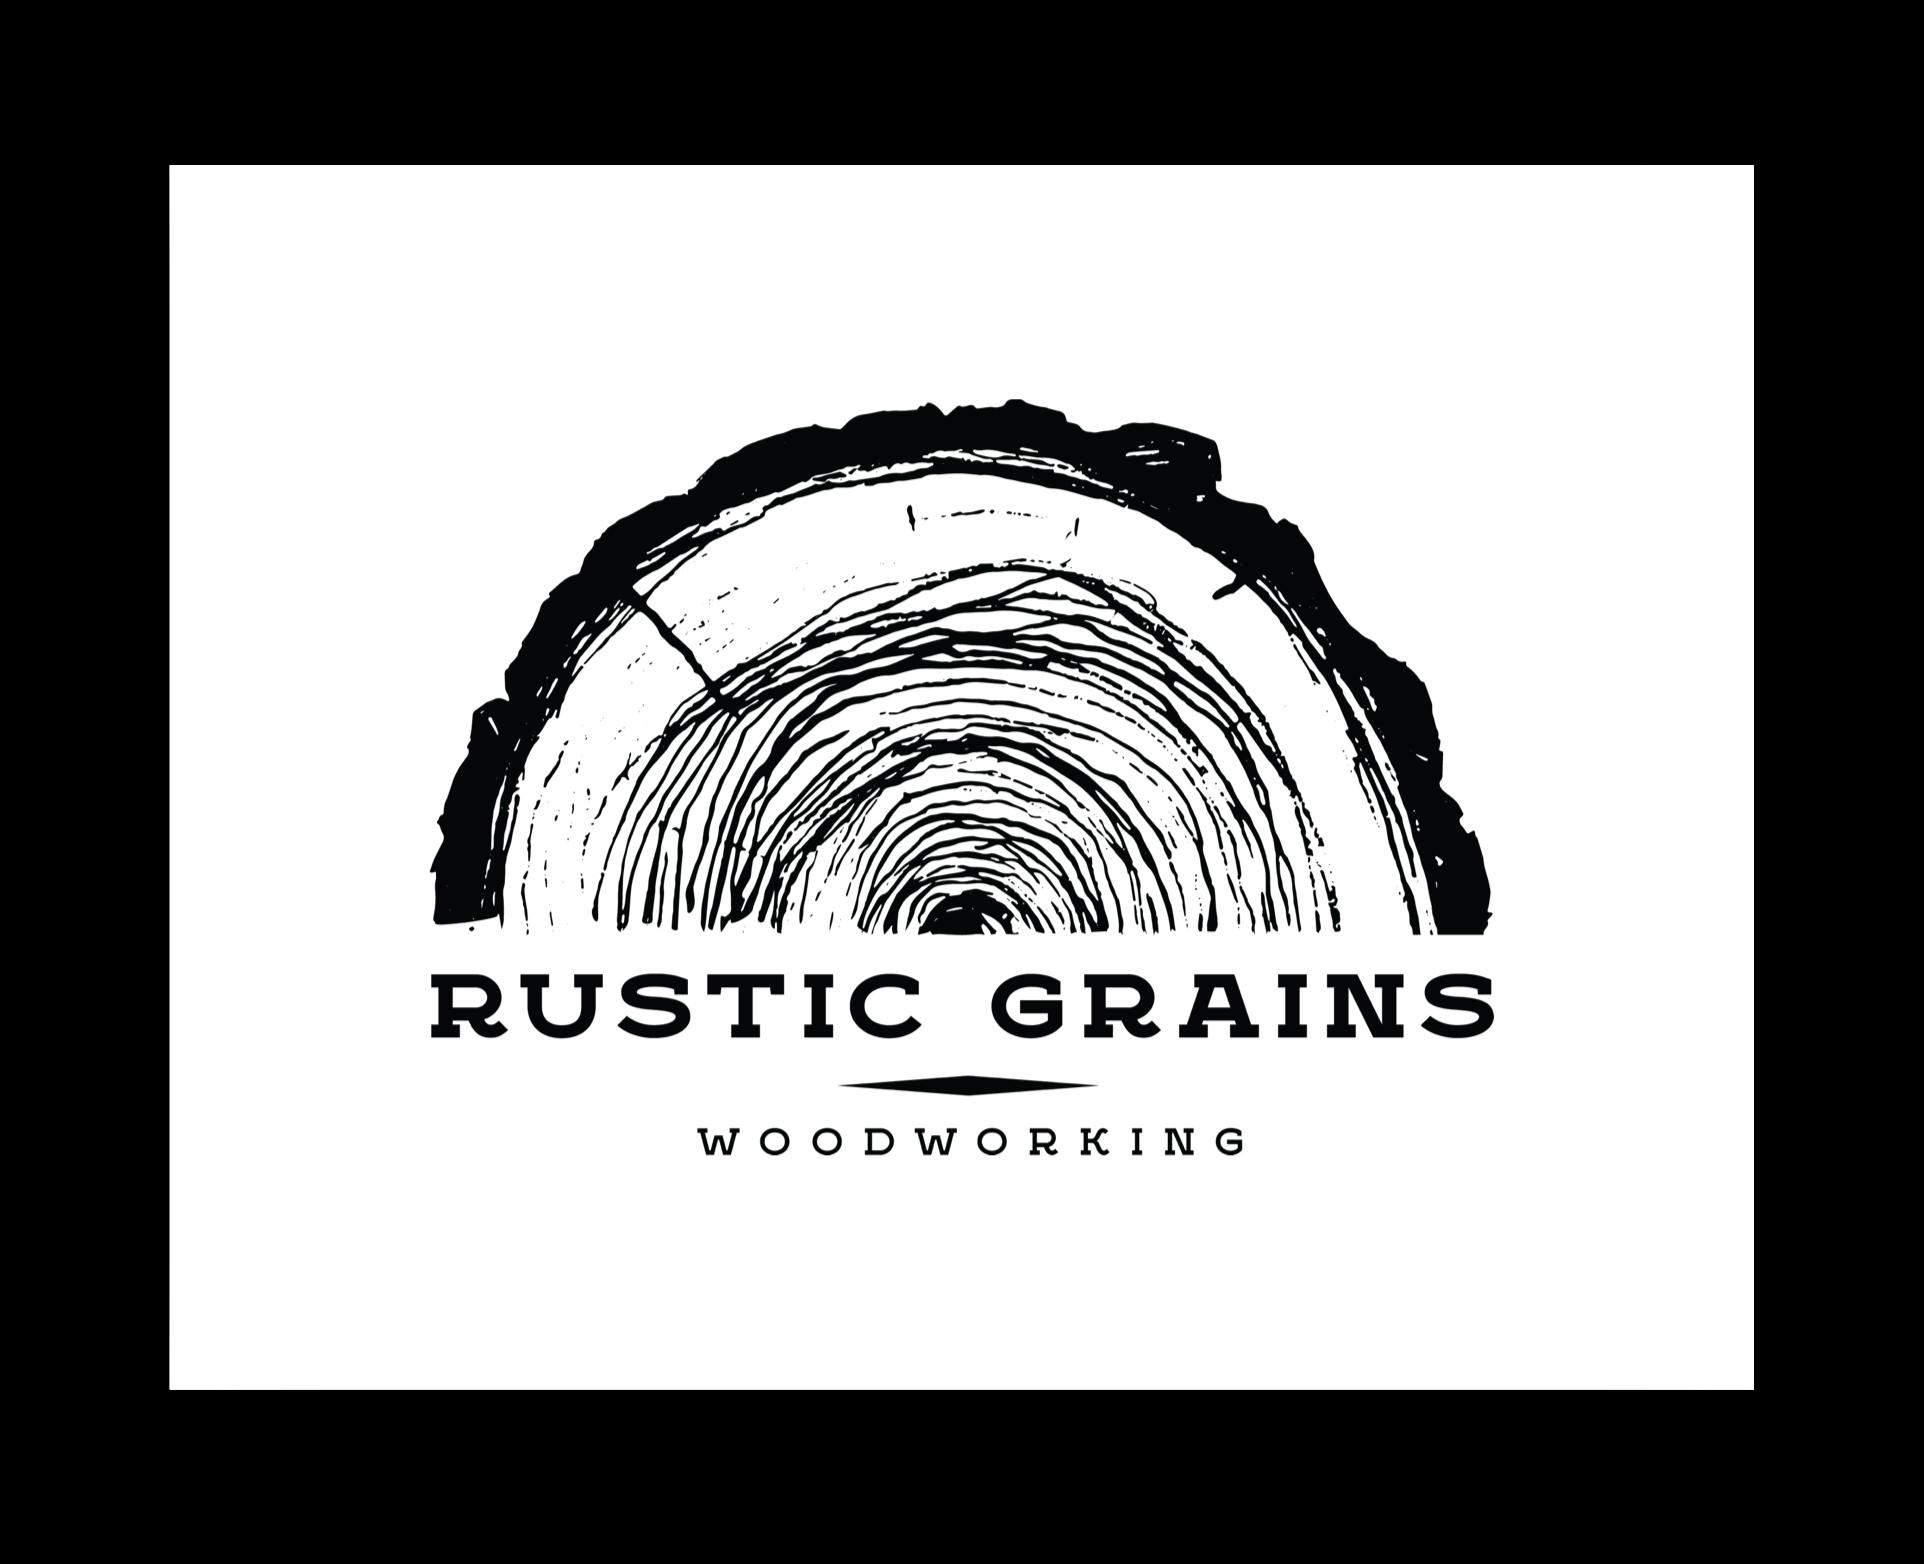 Rustic Grains